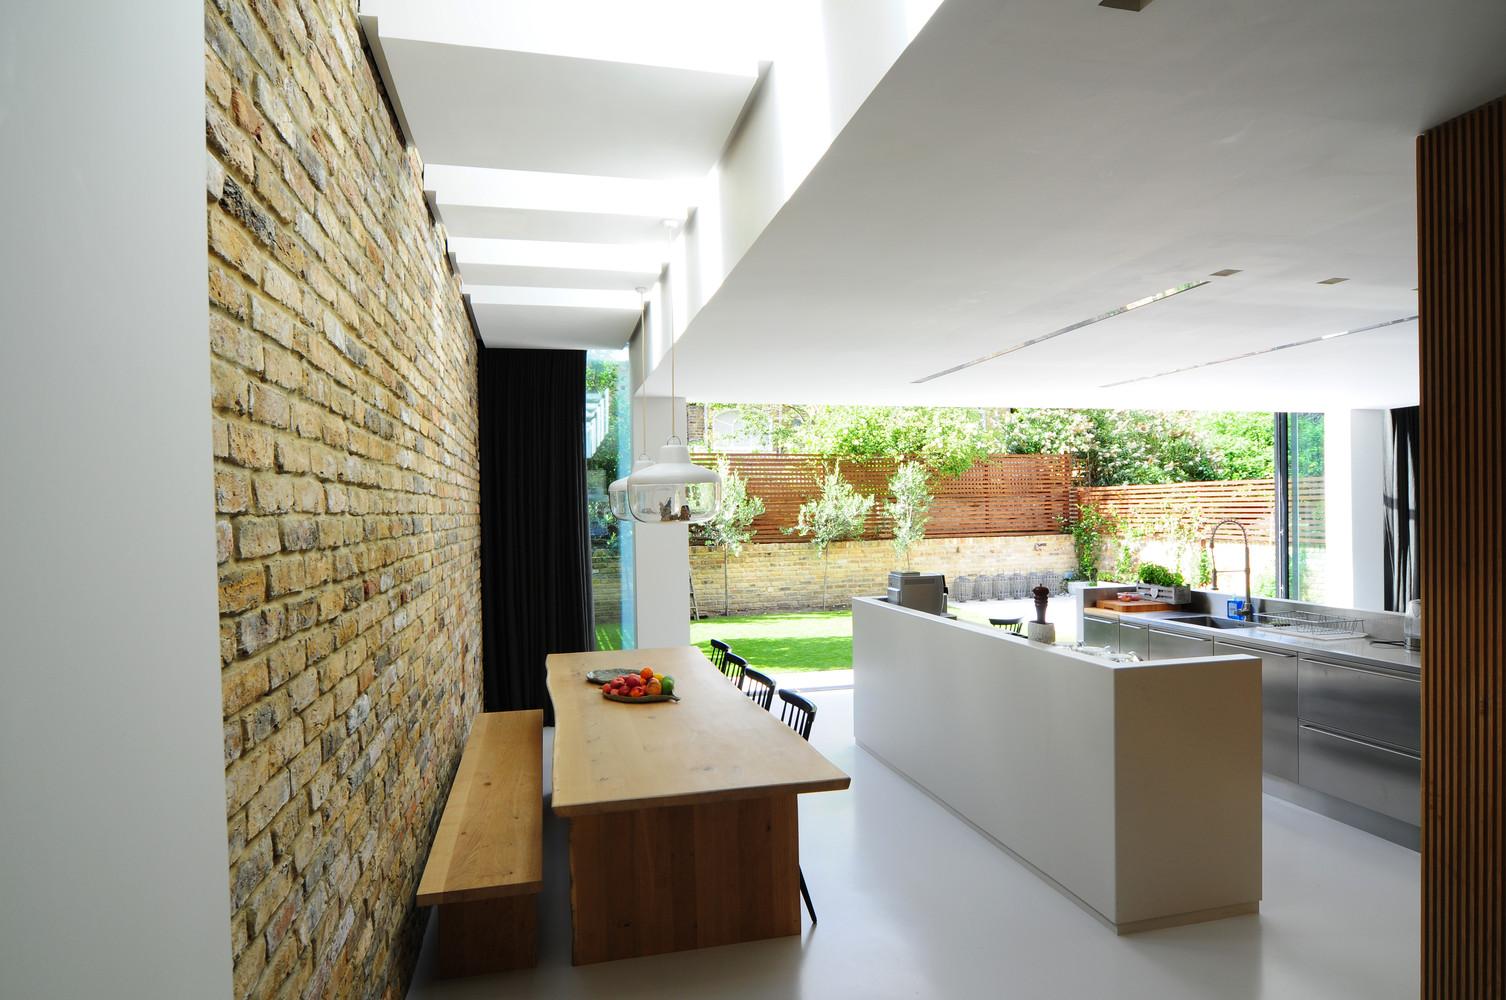 Gallery of homemade bureau de change design office 7